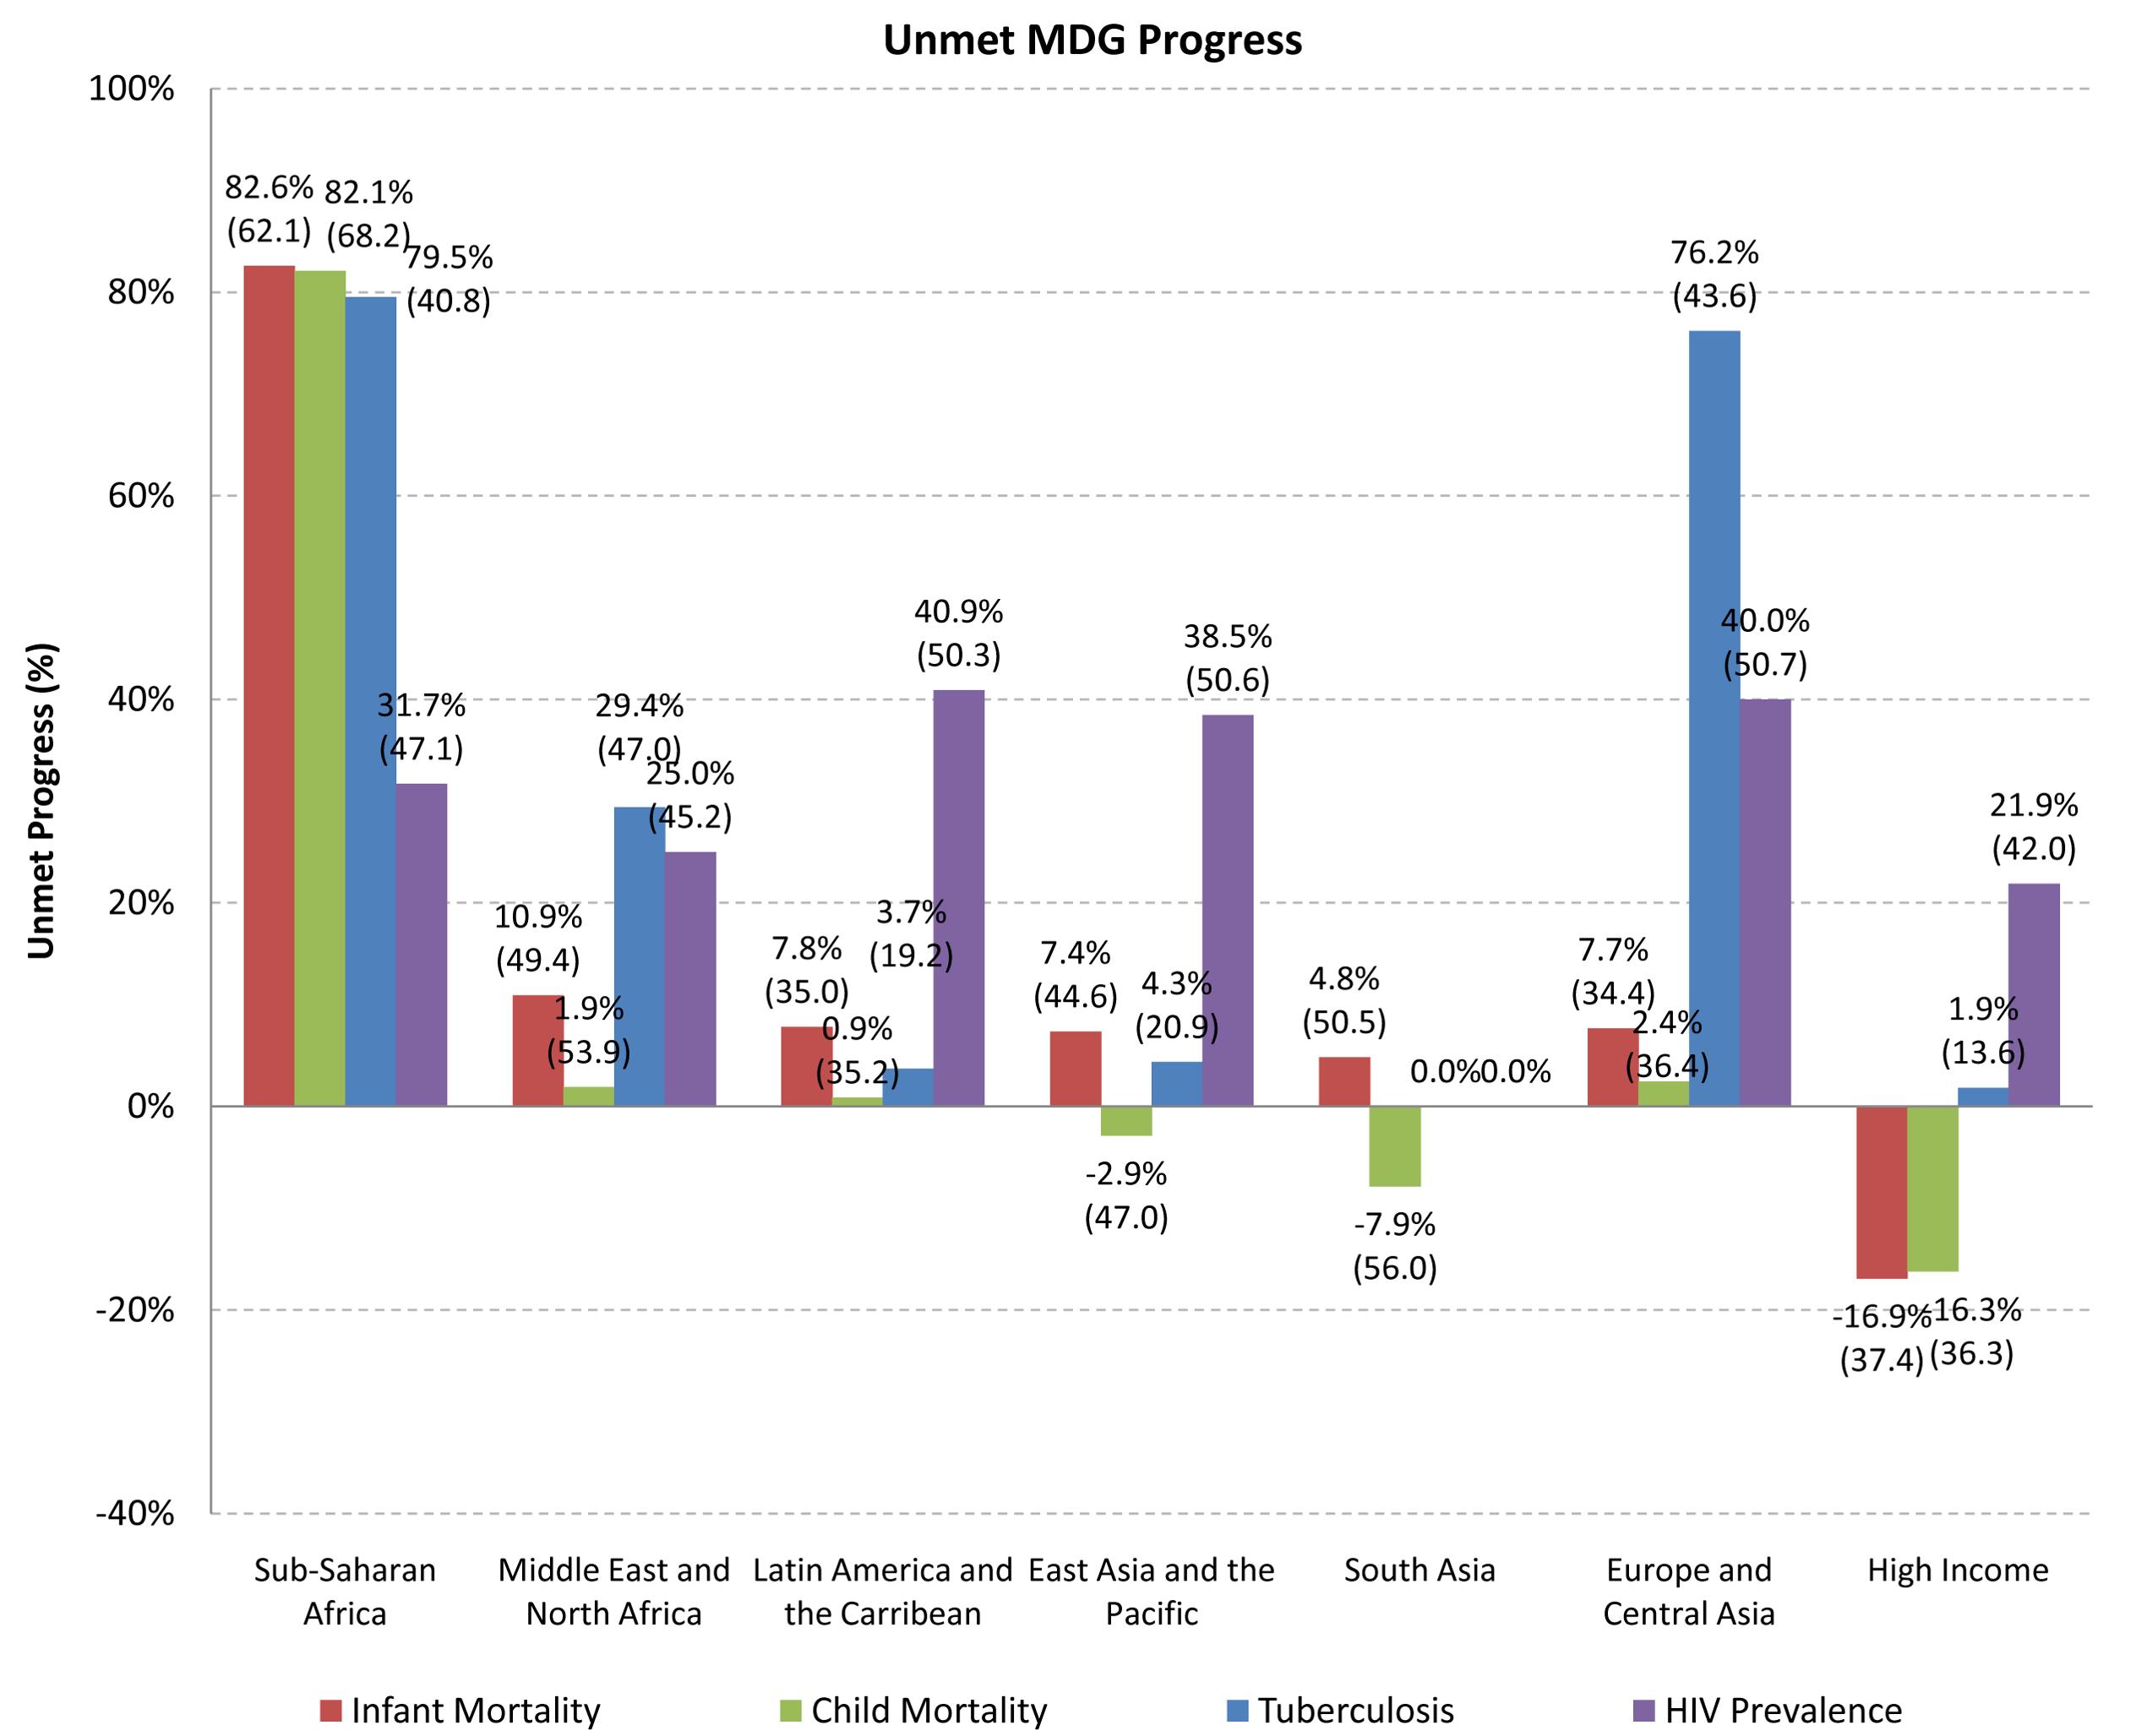 Unmet progress towards Millennium Development Goals, by geographic region.